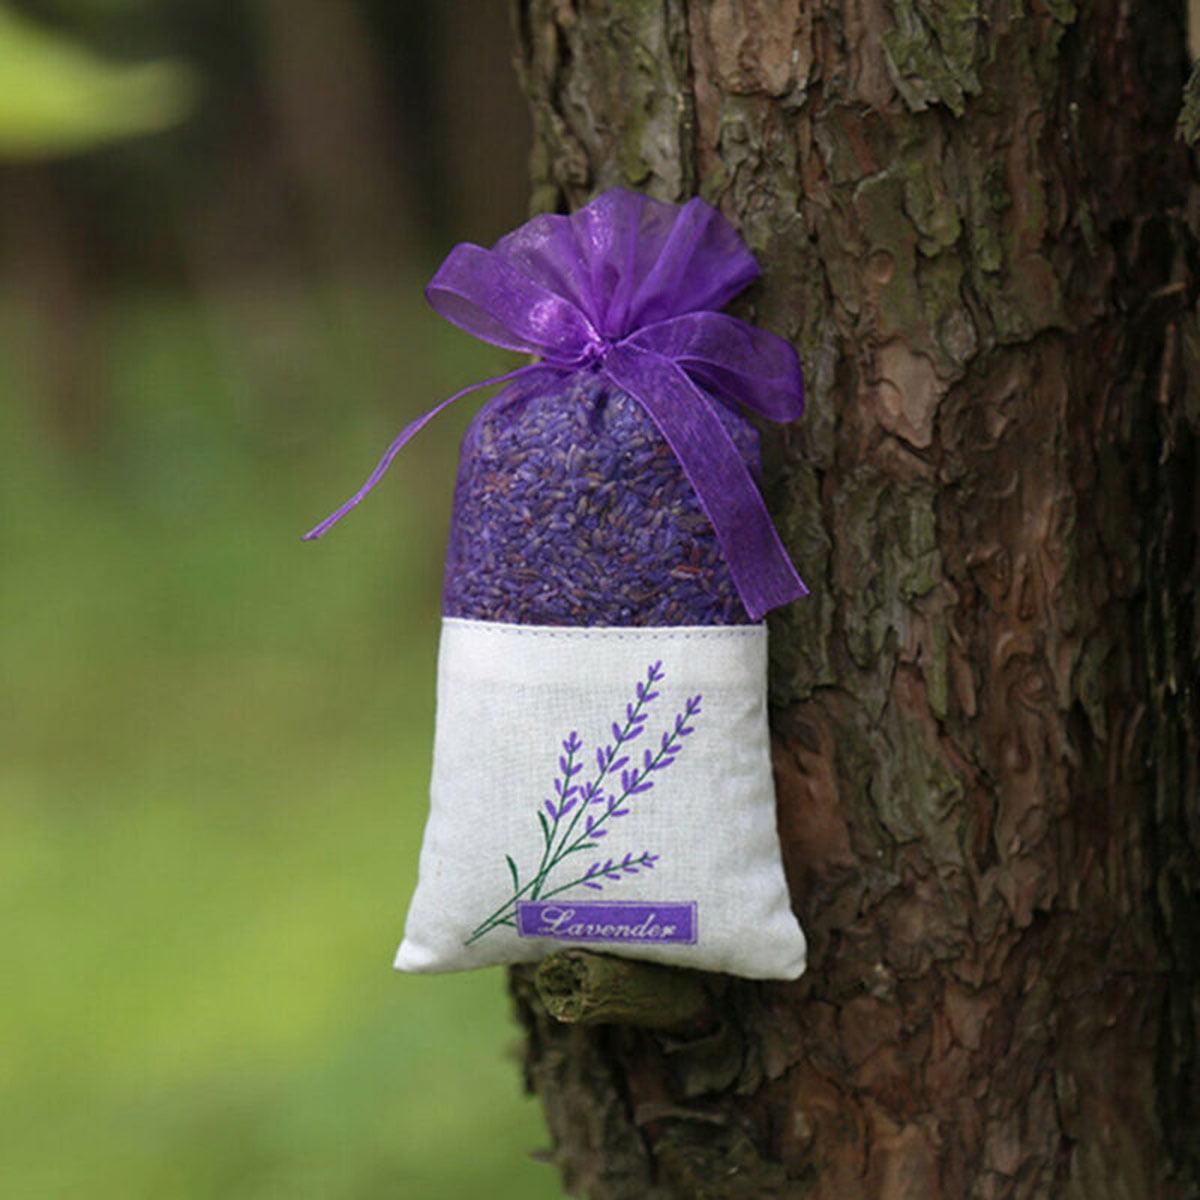 30pcs Empty Sachet Bags Fragrance Lavender Fragrance Bag Beans Spice Storage Bag